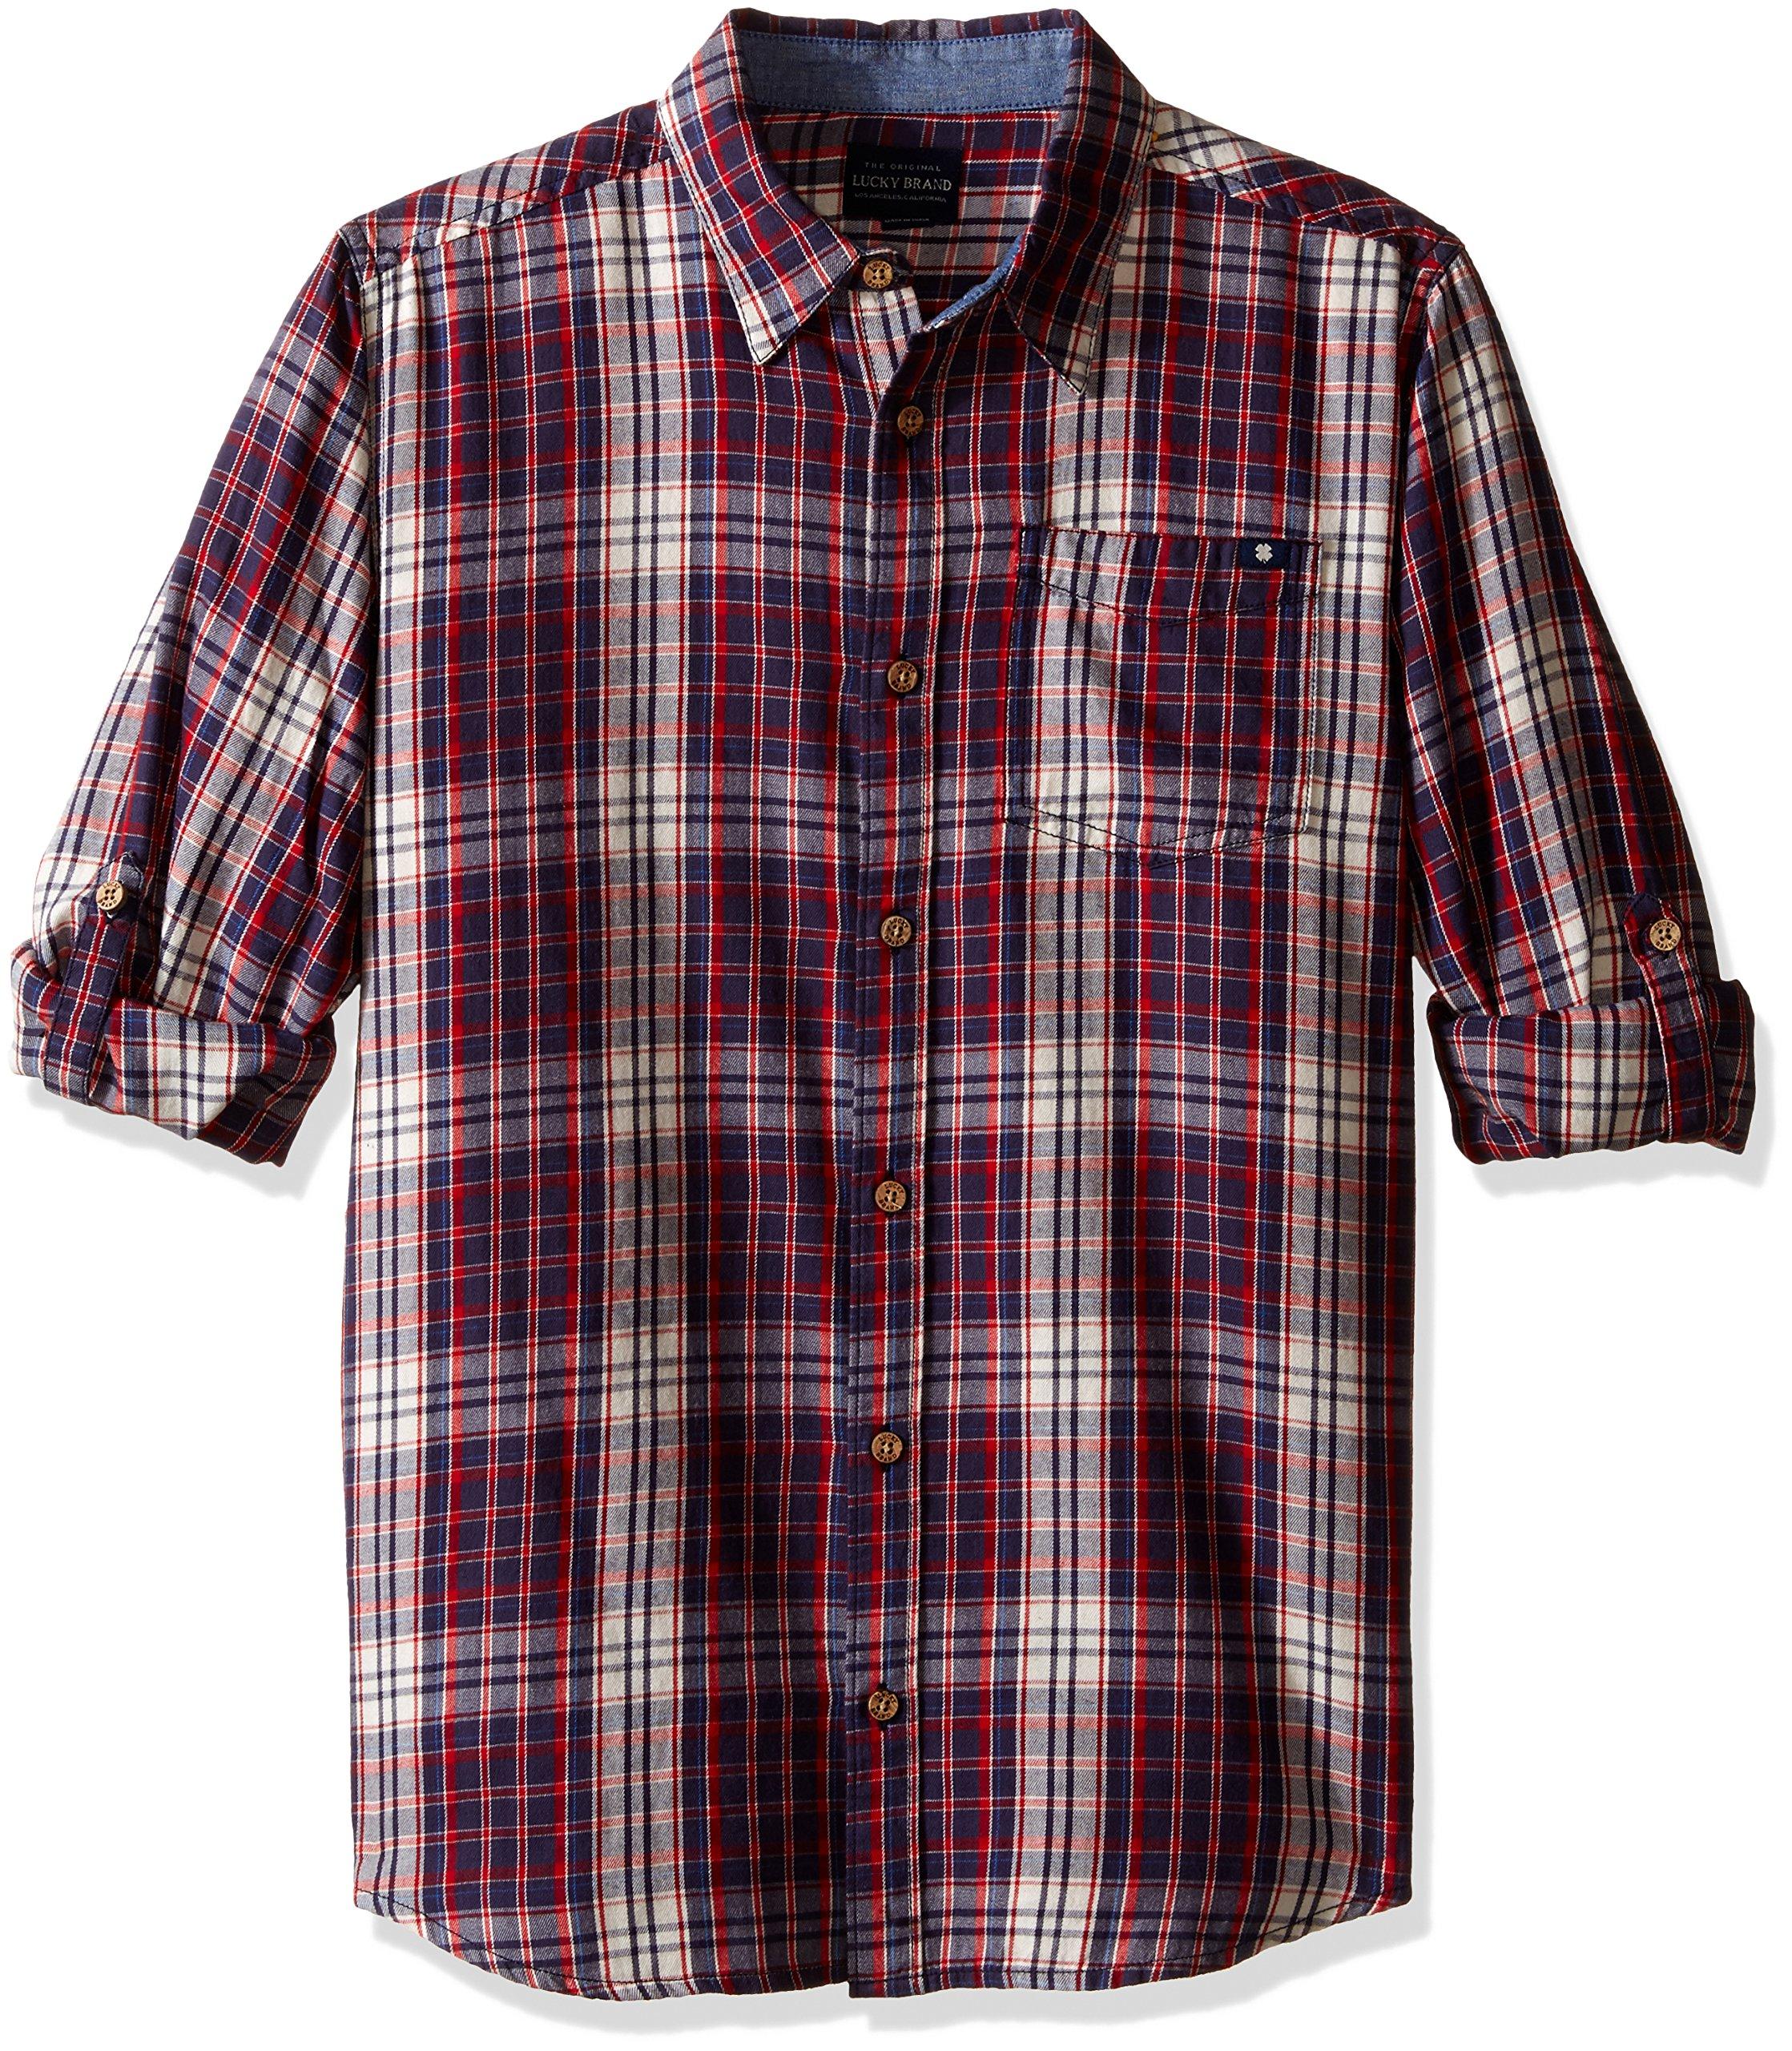 Lucky Brand Little Boys' Patriot Long Sleeve Plaid Sport Shirt, Peacoat, 4